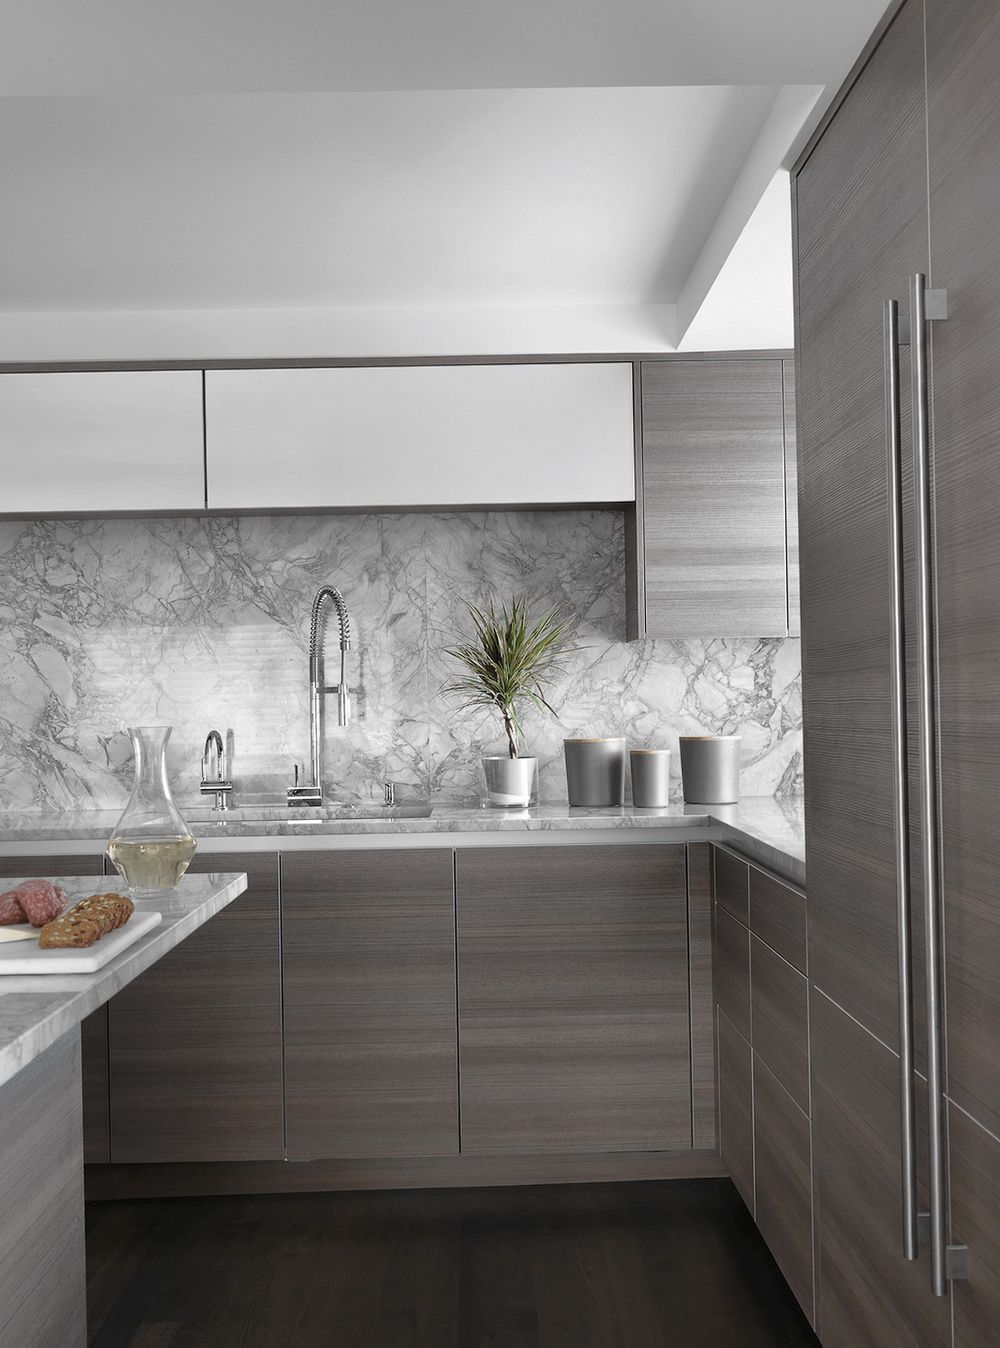 Poggenpohl Kitchen Cabinets Interior Design Kitchen Kitchen Interior Kitchen Design